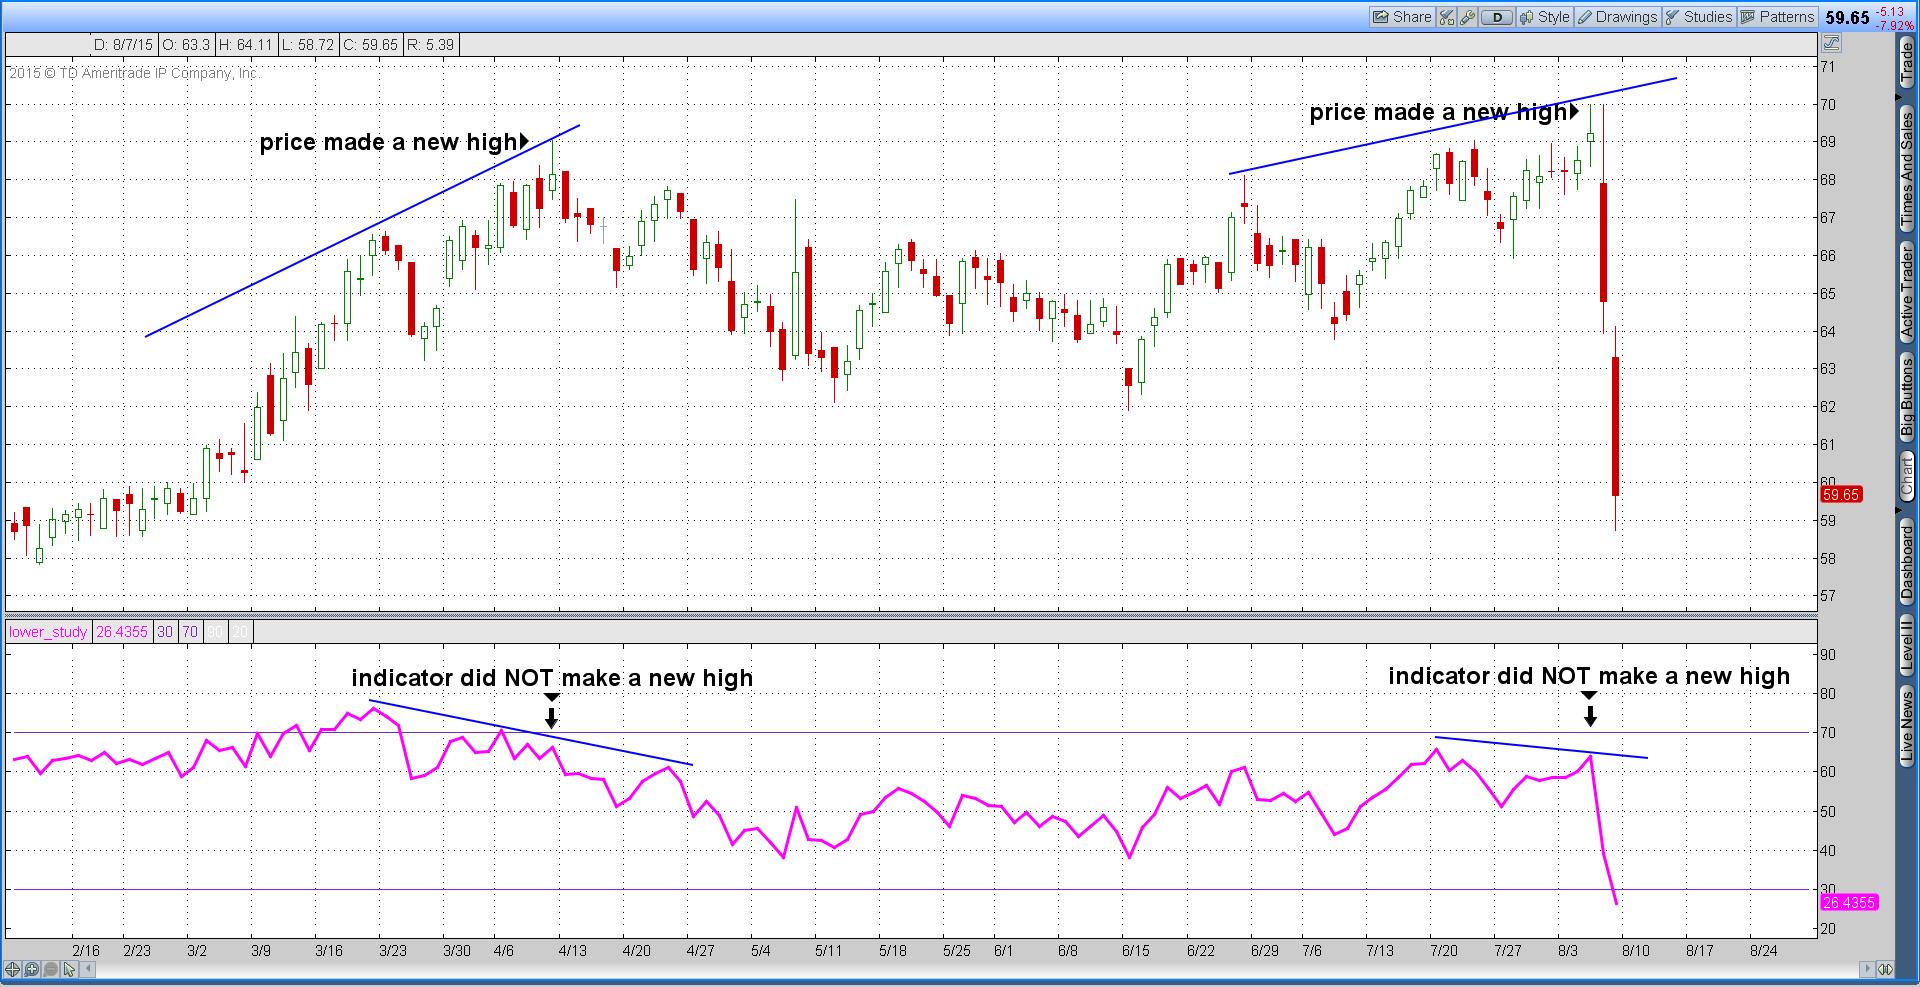 Bearish chart divergence